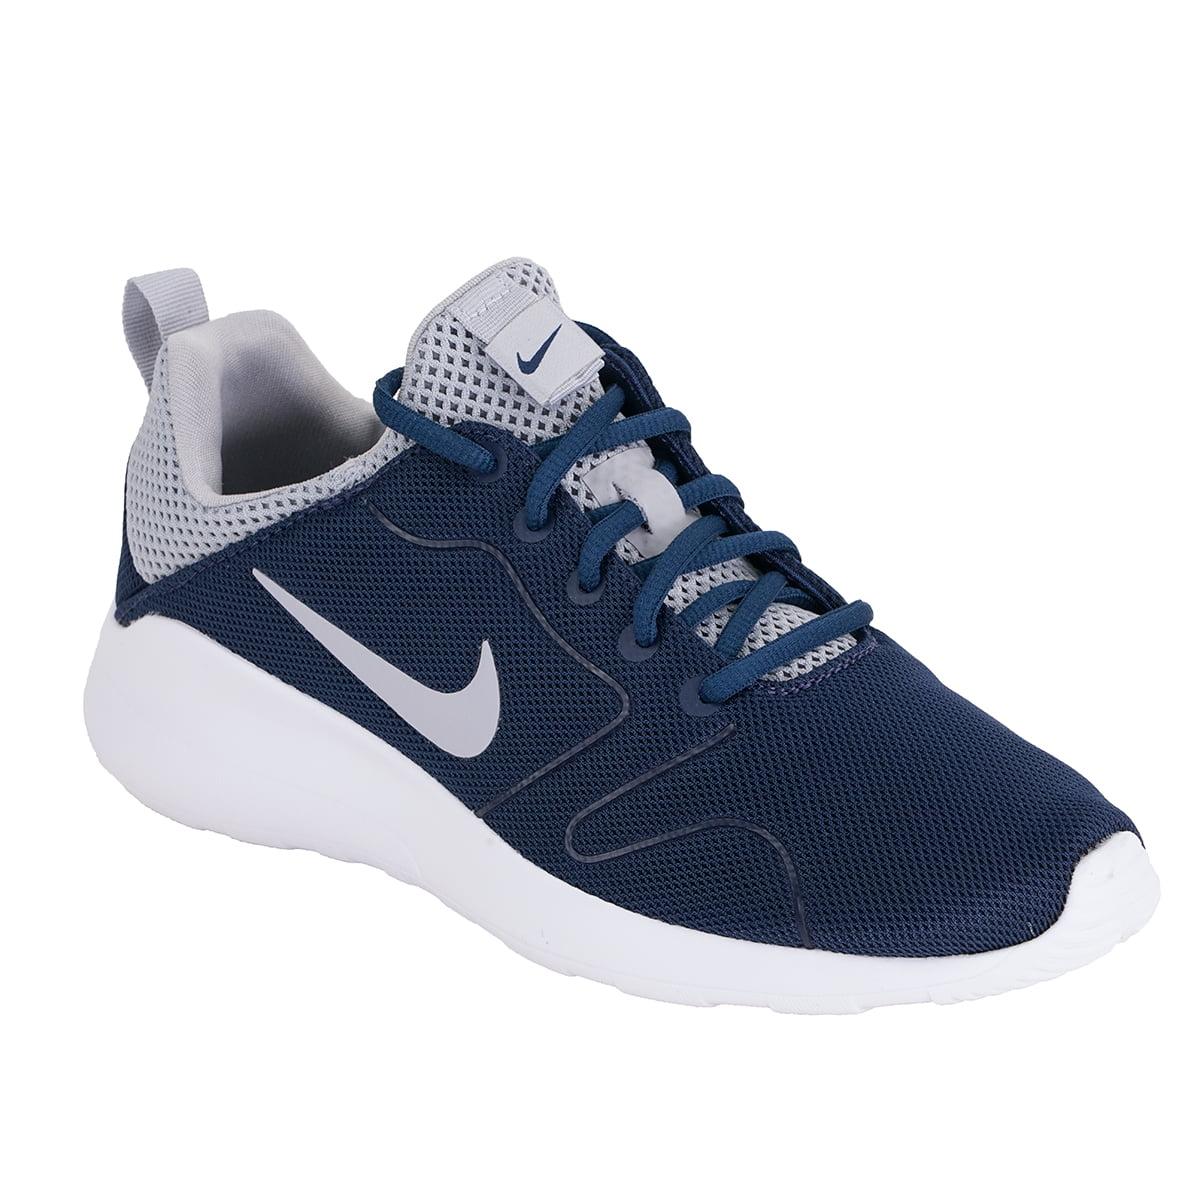 Nike Roshe One Wmns total crimsonwhite ab 64,71